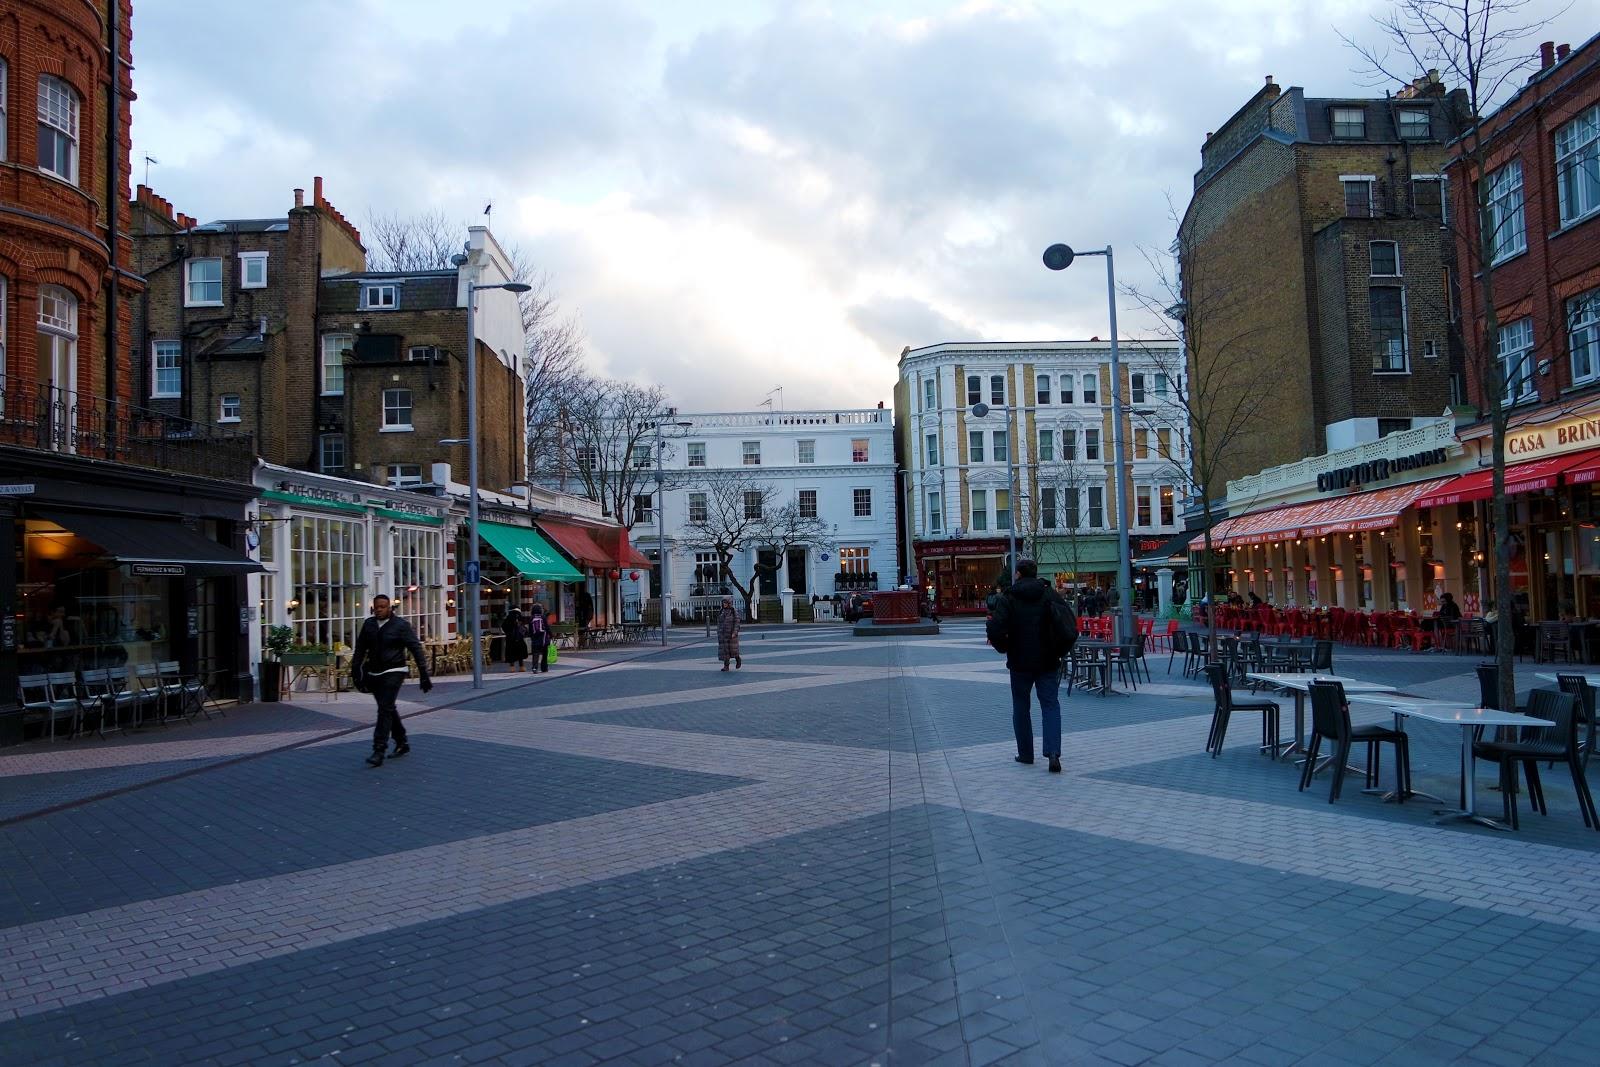 exhibition Road, South Kensington, London, Londres, vlog, blog, travel, travelling, london streets, french,